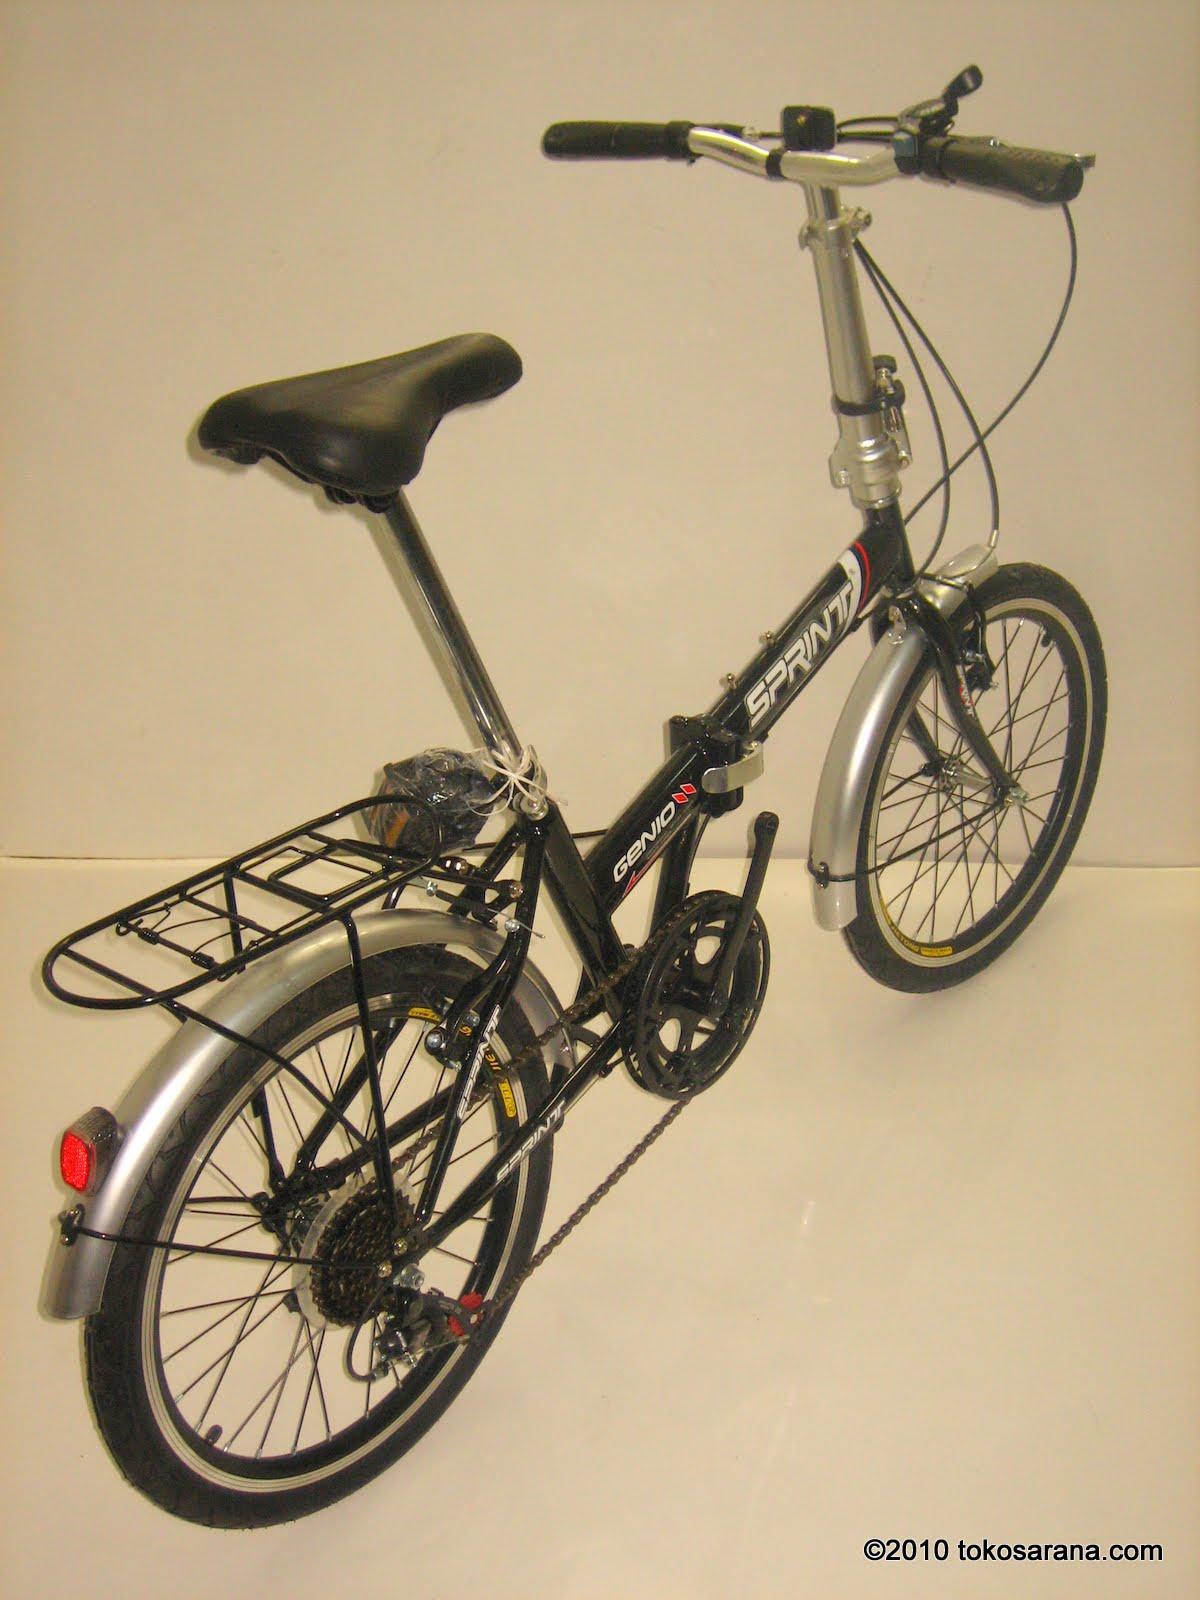 tokomagenta: A Showcase of Products: Sepeda Lipat GENIO 20